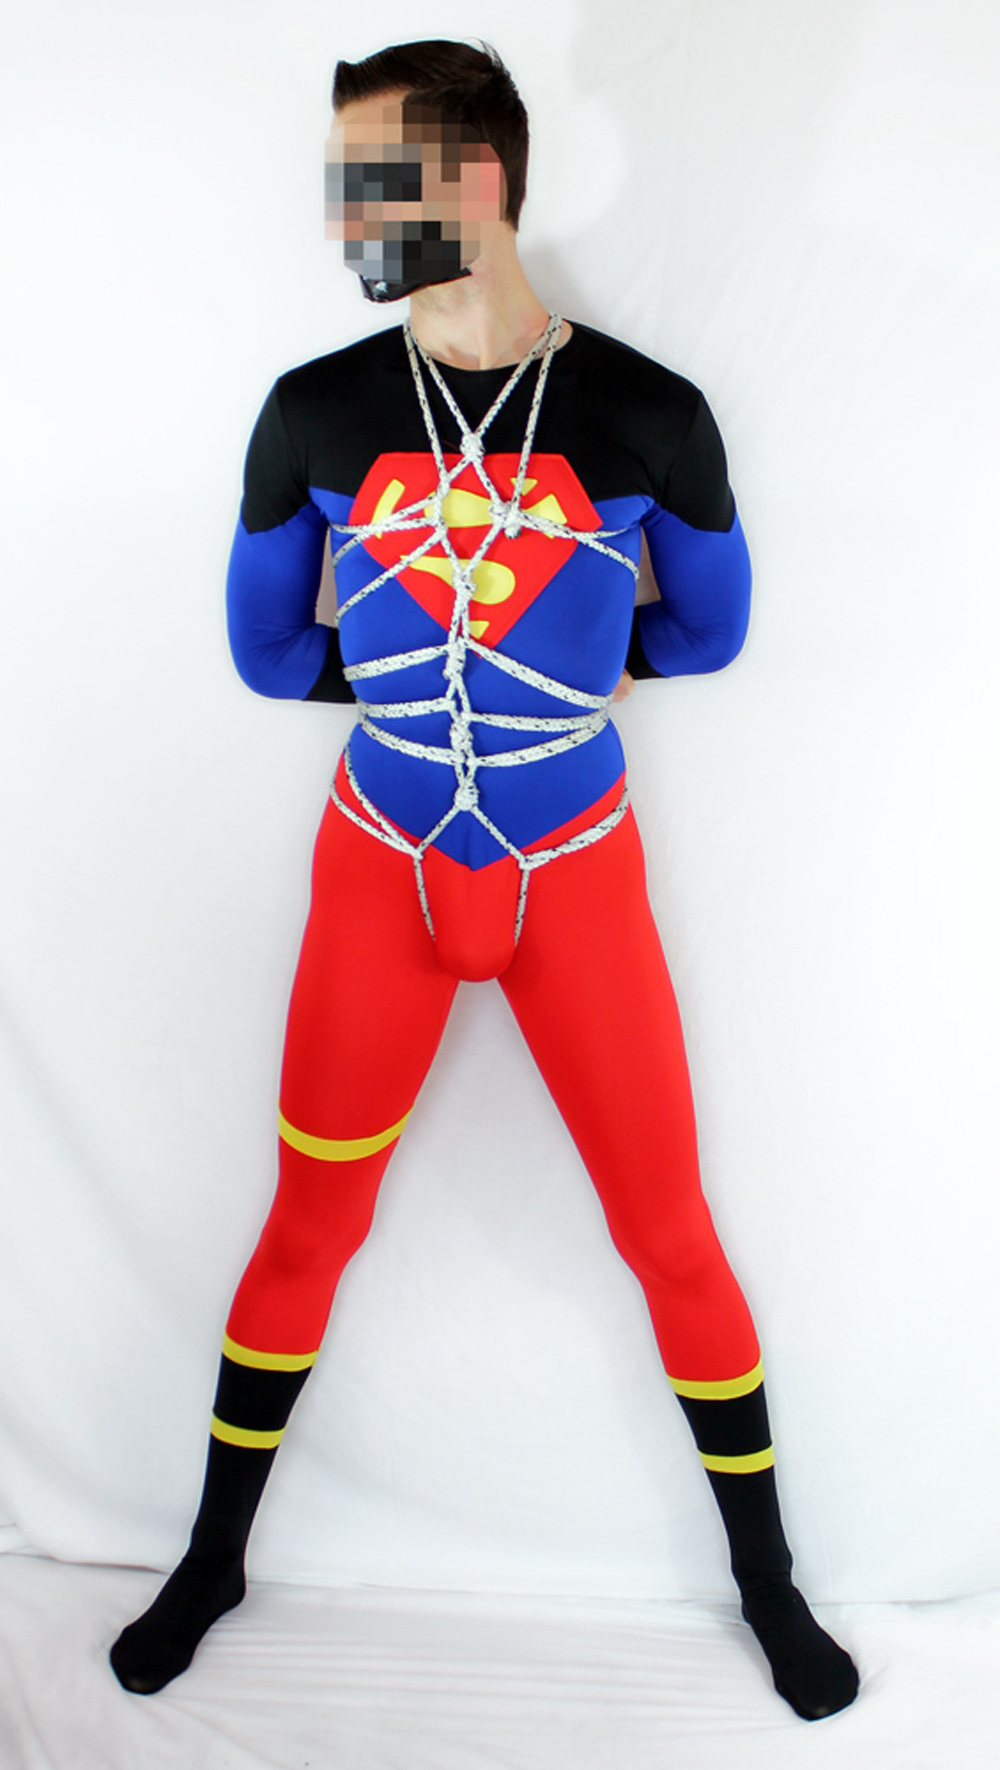 Superboy_07.jpg